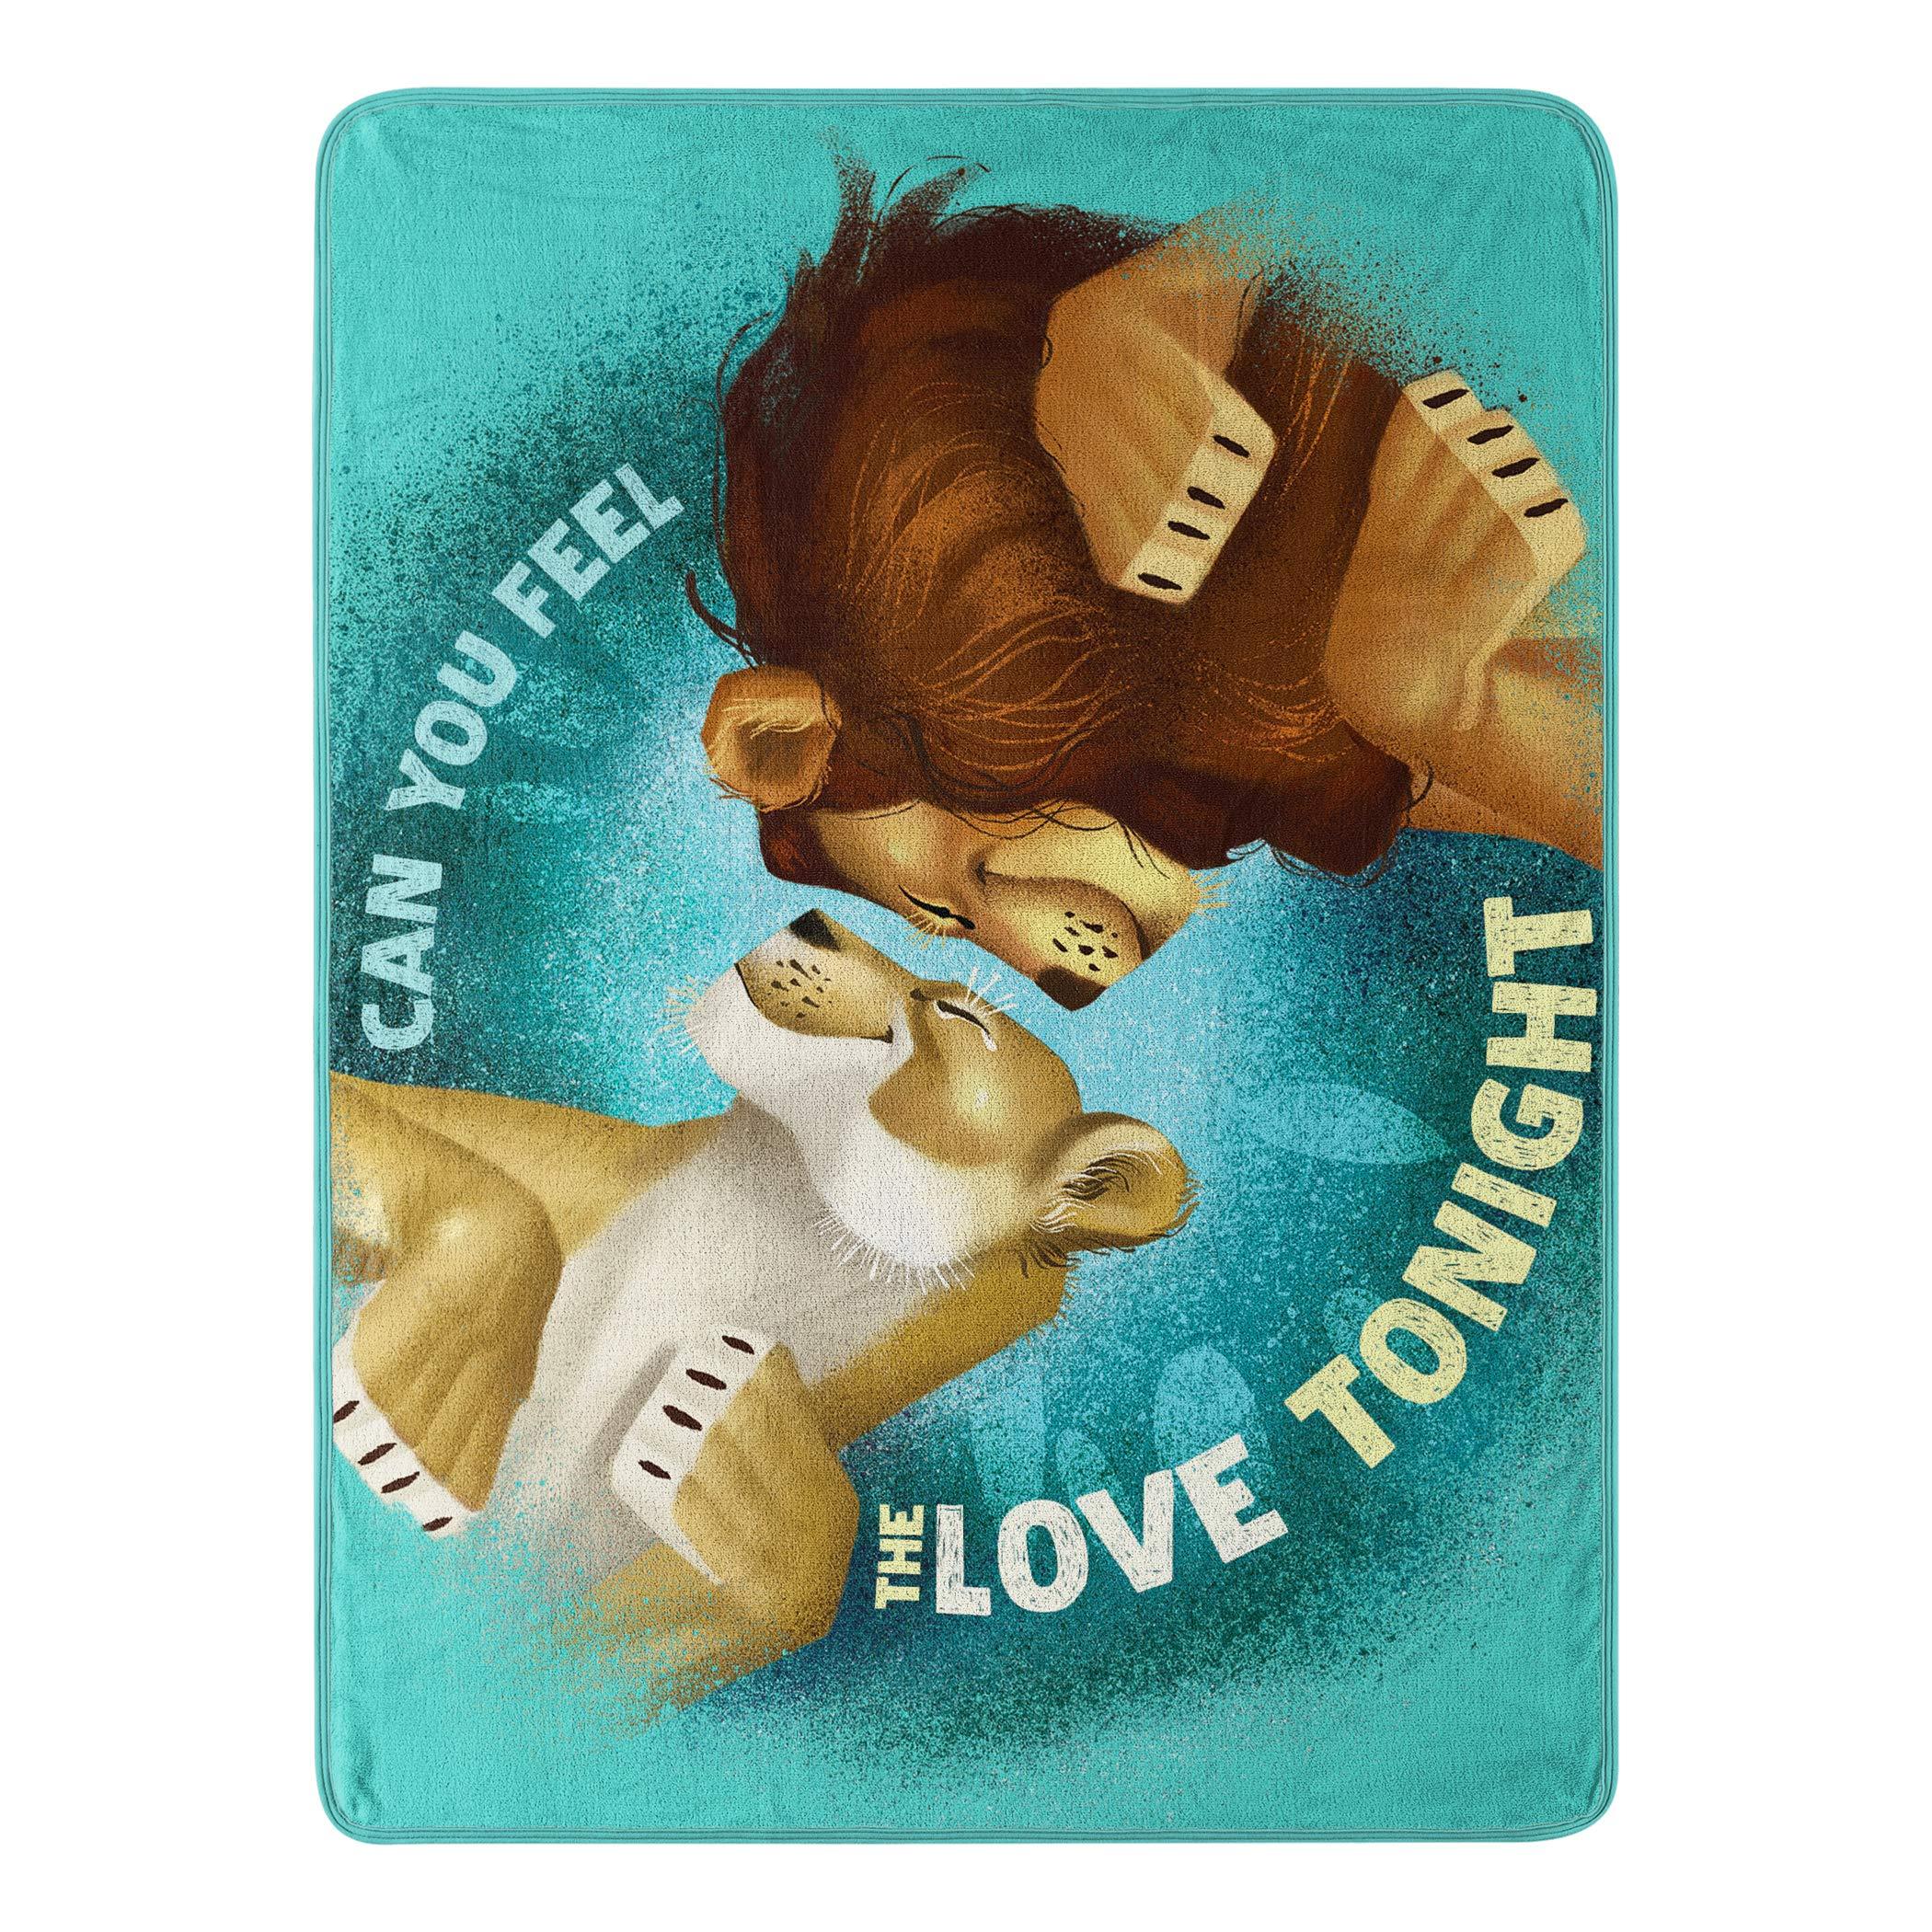 Disney's The Lion King, ''Feel The Love'' Micro Raschel Throw Blanket, 46'' x 60'', Multi Color by Disney